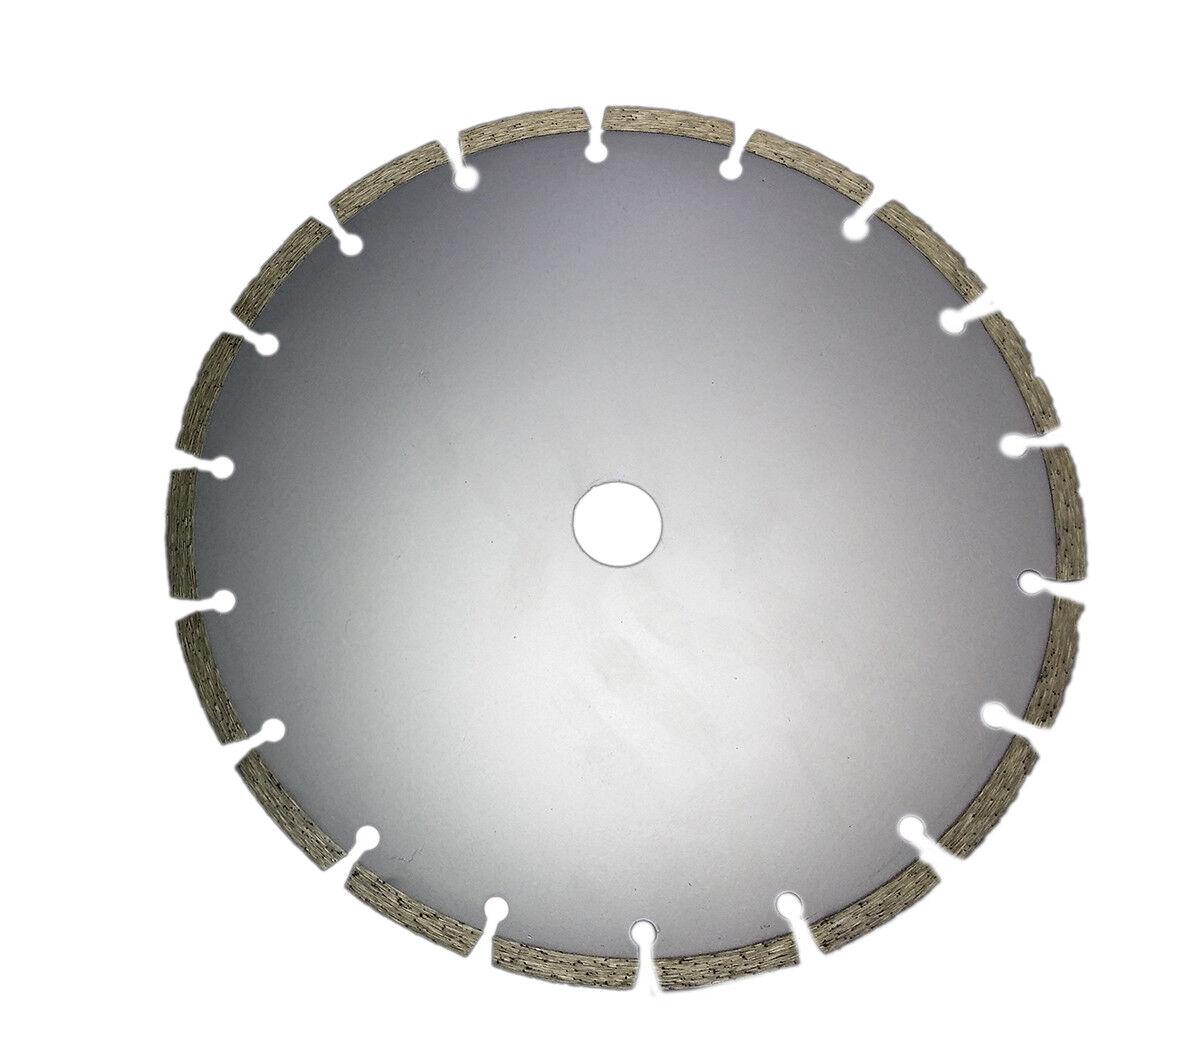 Wolfcraft 8381000 Disco da taglio diamantatoStandard Ceramic /ø 110 mm